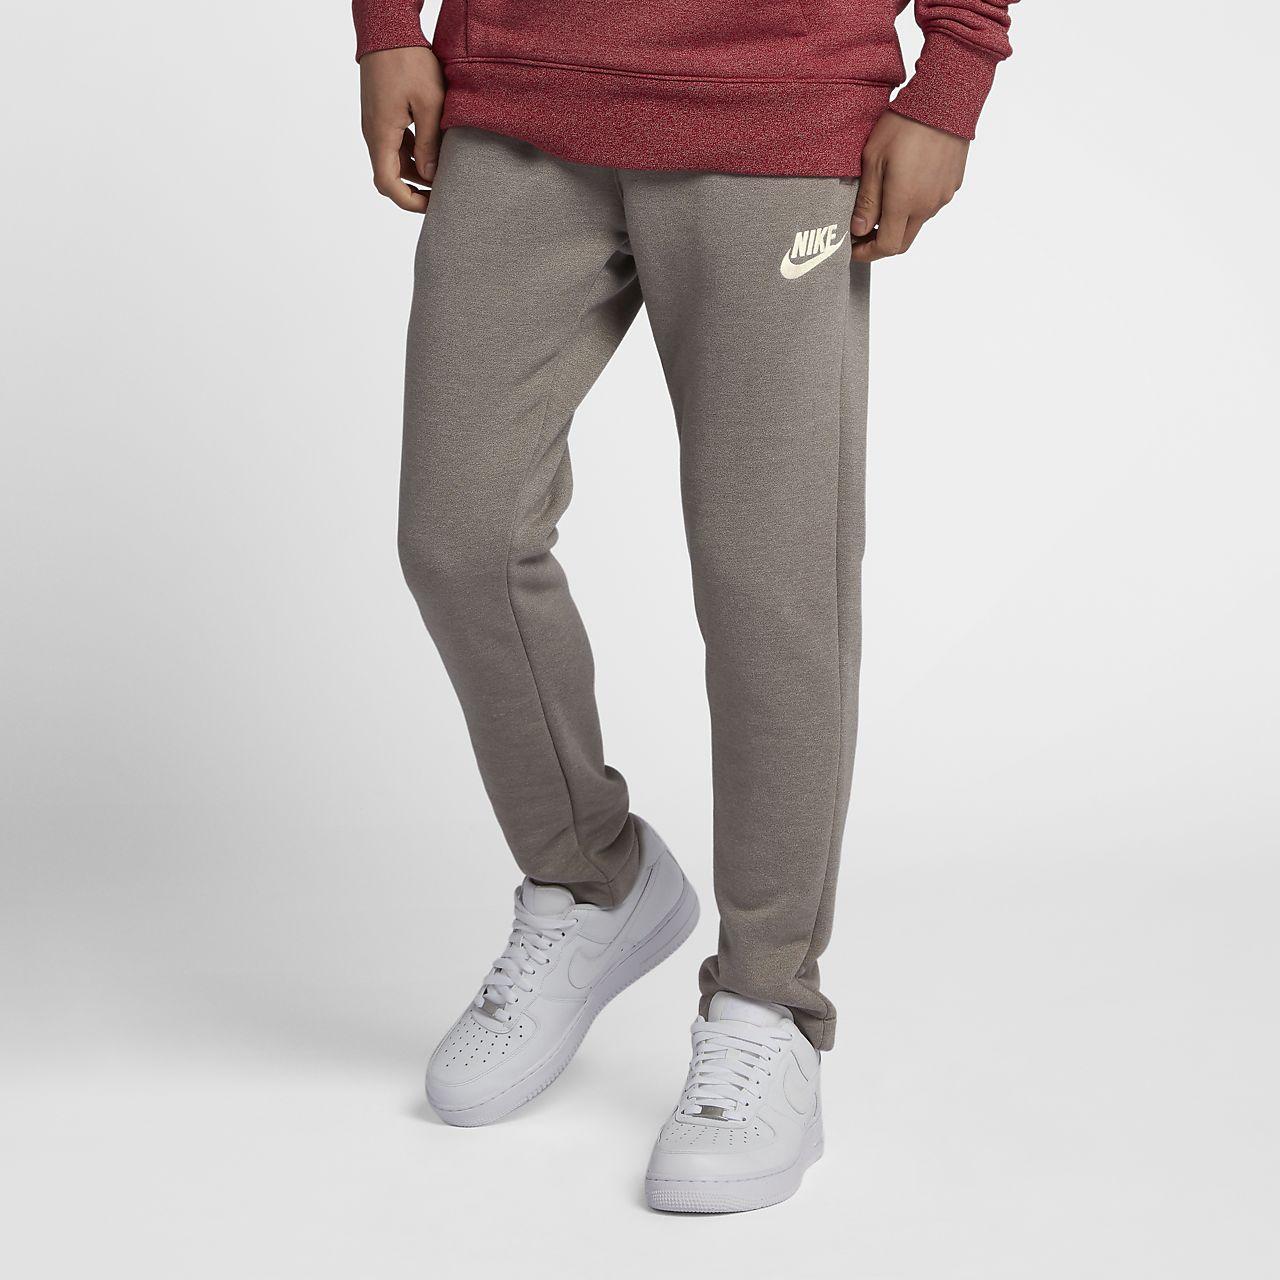 9c330861ae33 Nike Sportswear Heritage Men s Pants. Nike.com